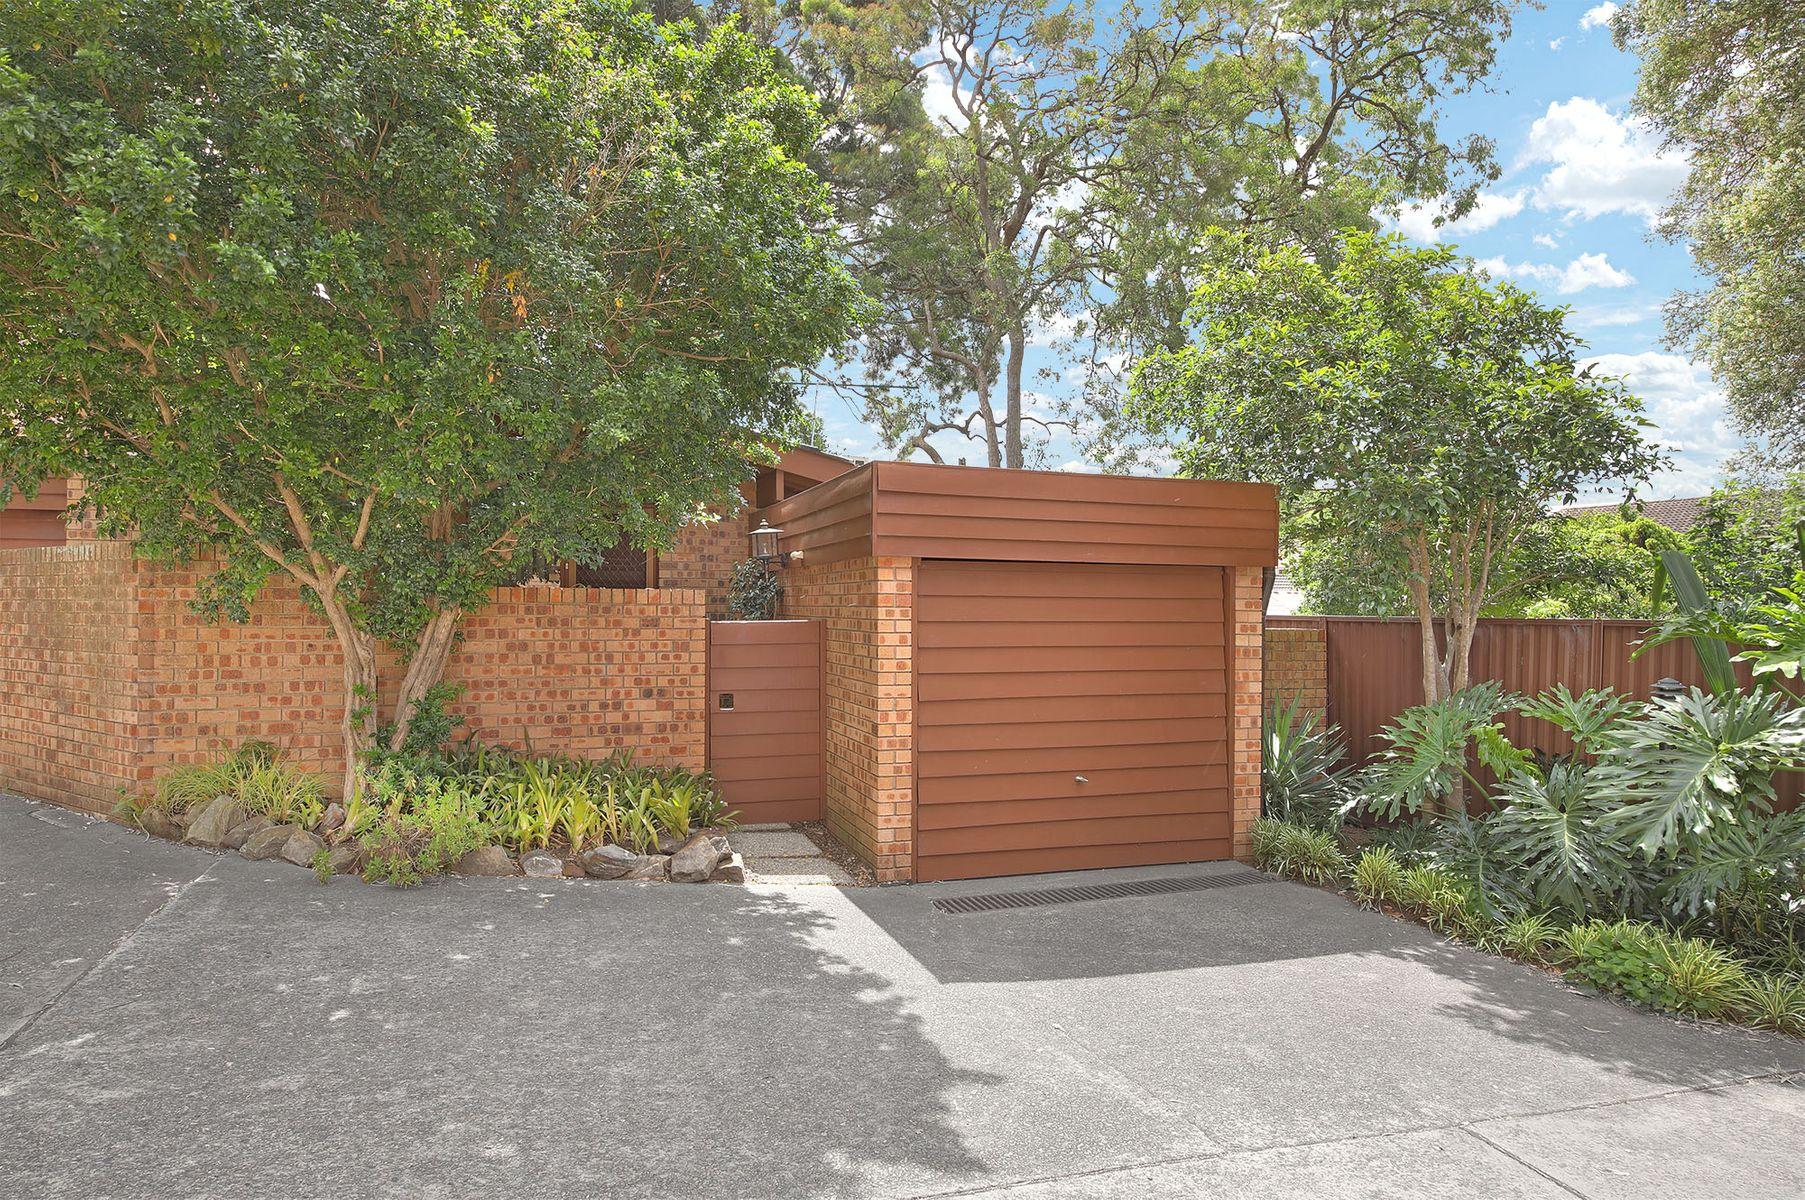 3/57 Uranus Road, Revesby, NSW 2212